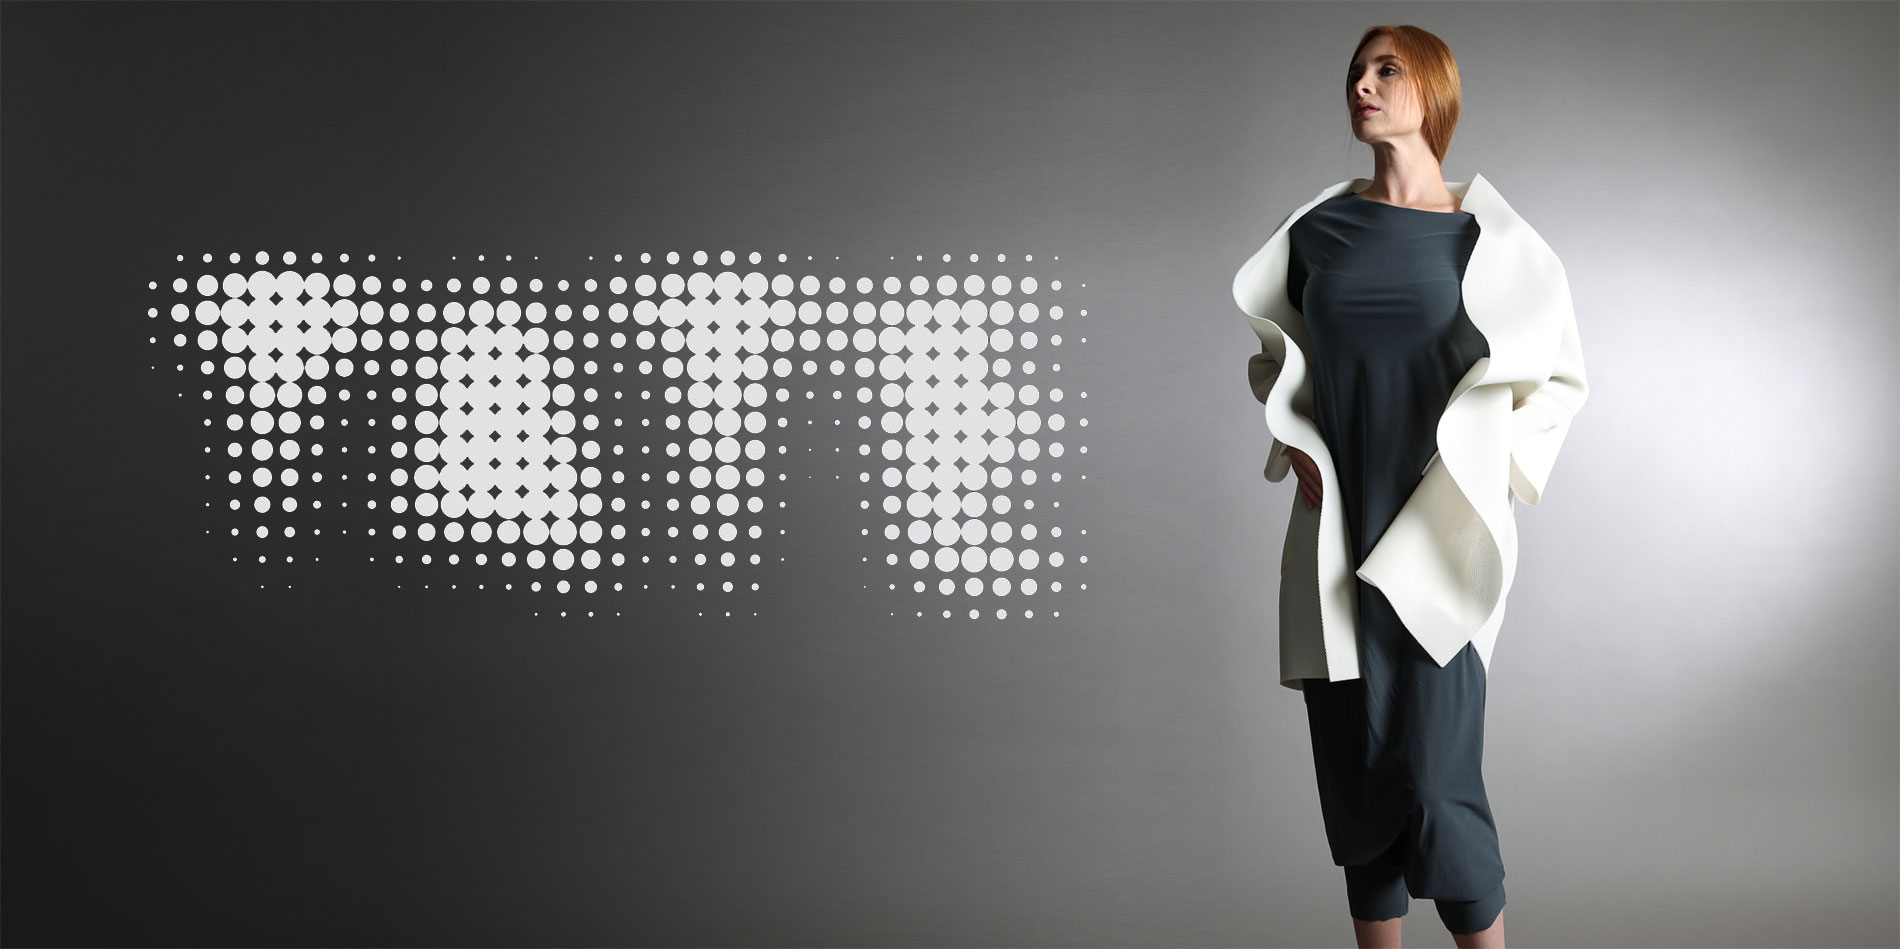 TATE MODERN shows LINIERT